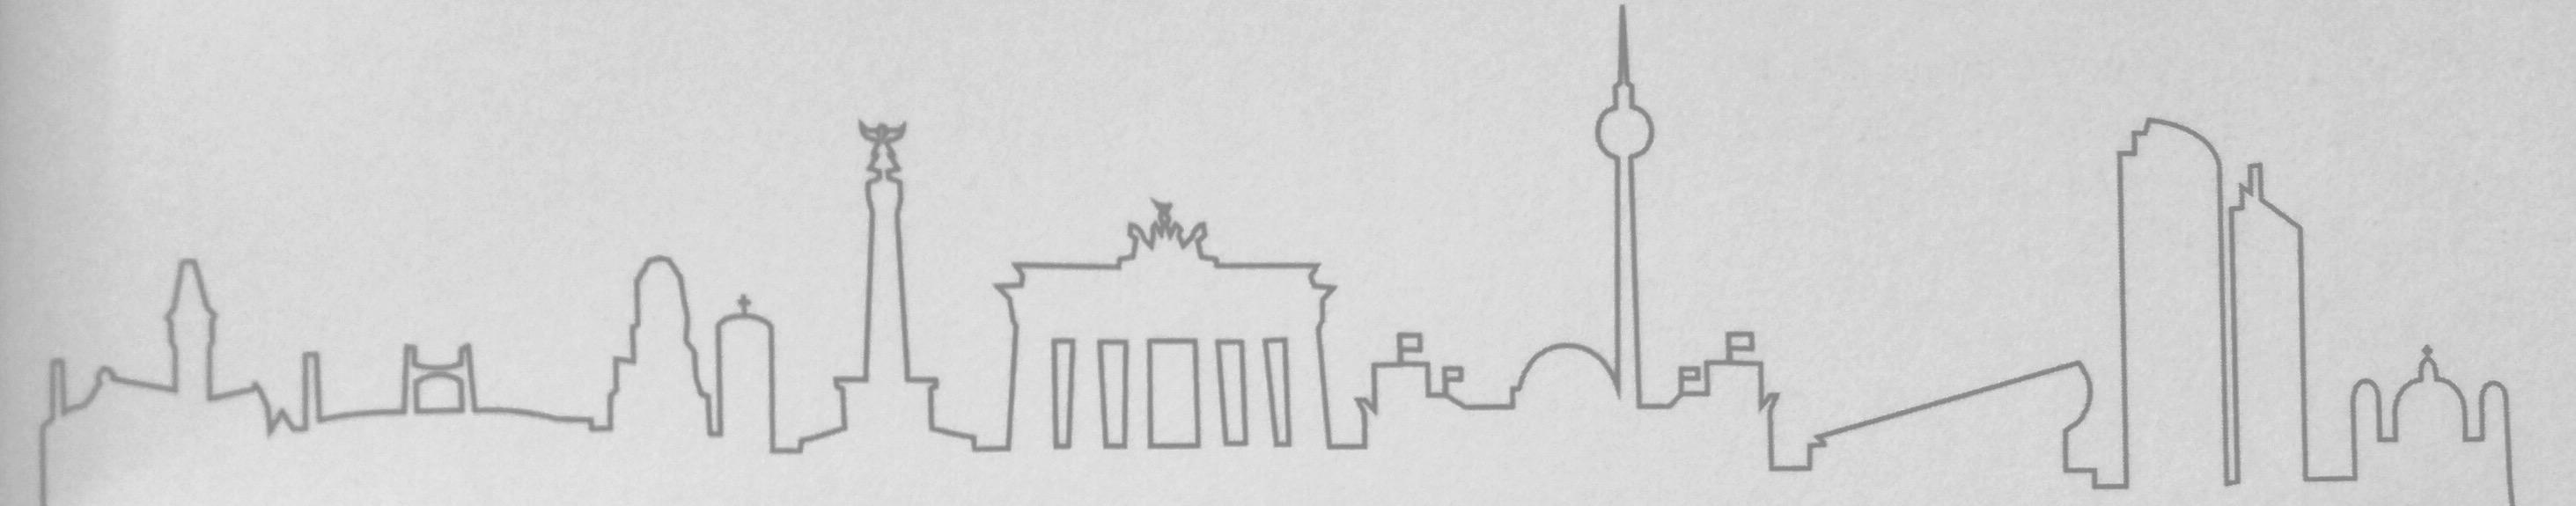 Berliner Silhouette